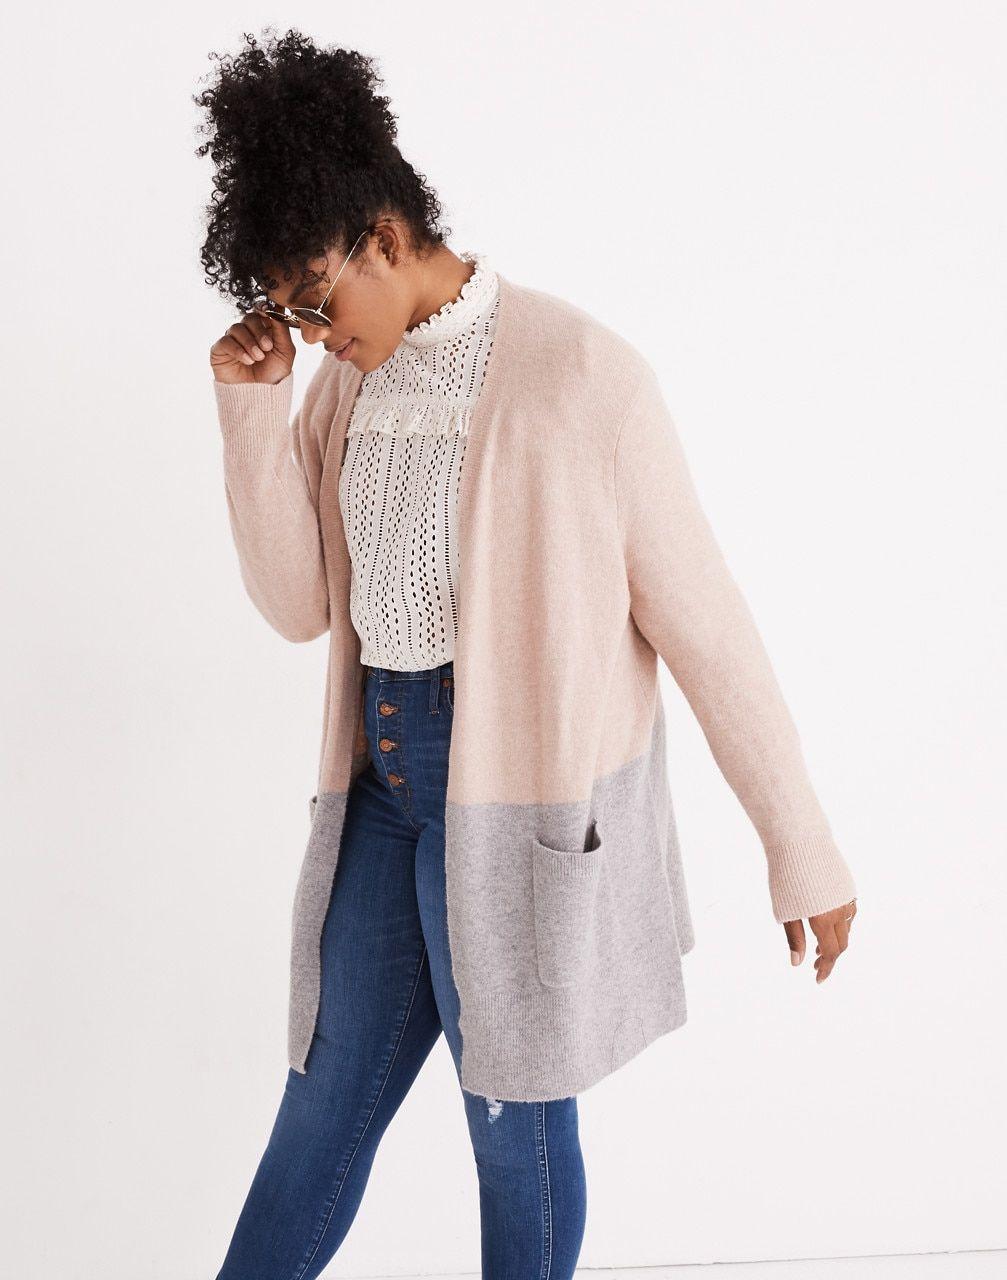 4f049f28131 Kent Colorblock Cardigan Sweater in Coziest Yarn in heather beige image 1